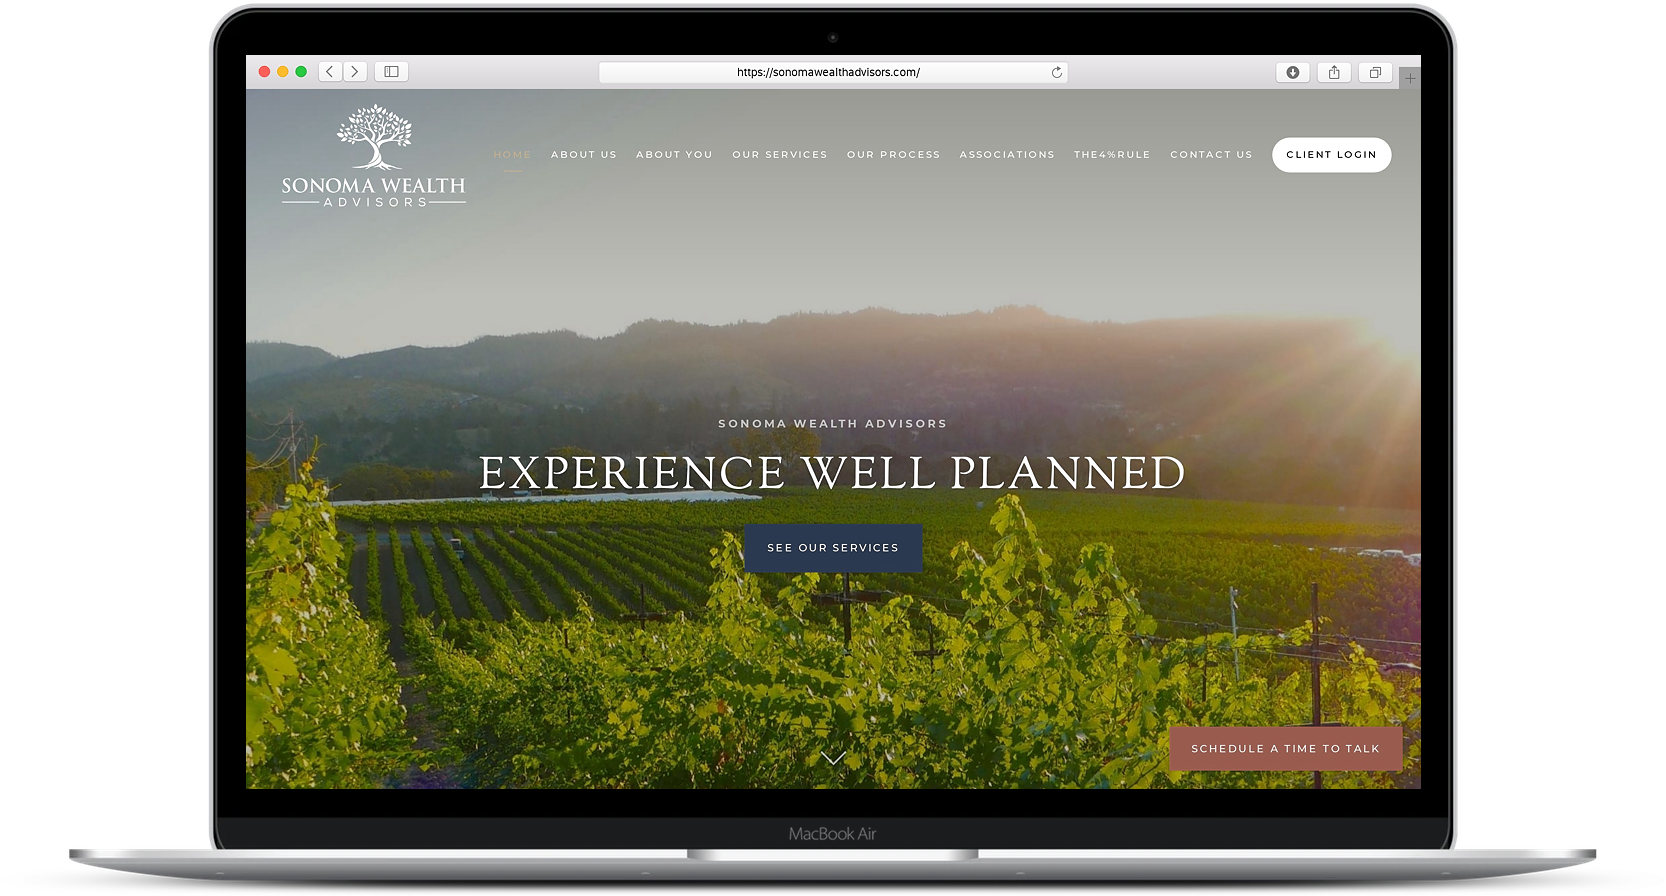 Sonoma Wealth Advisors